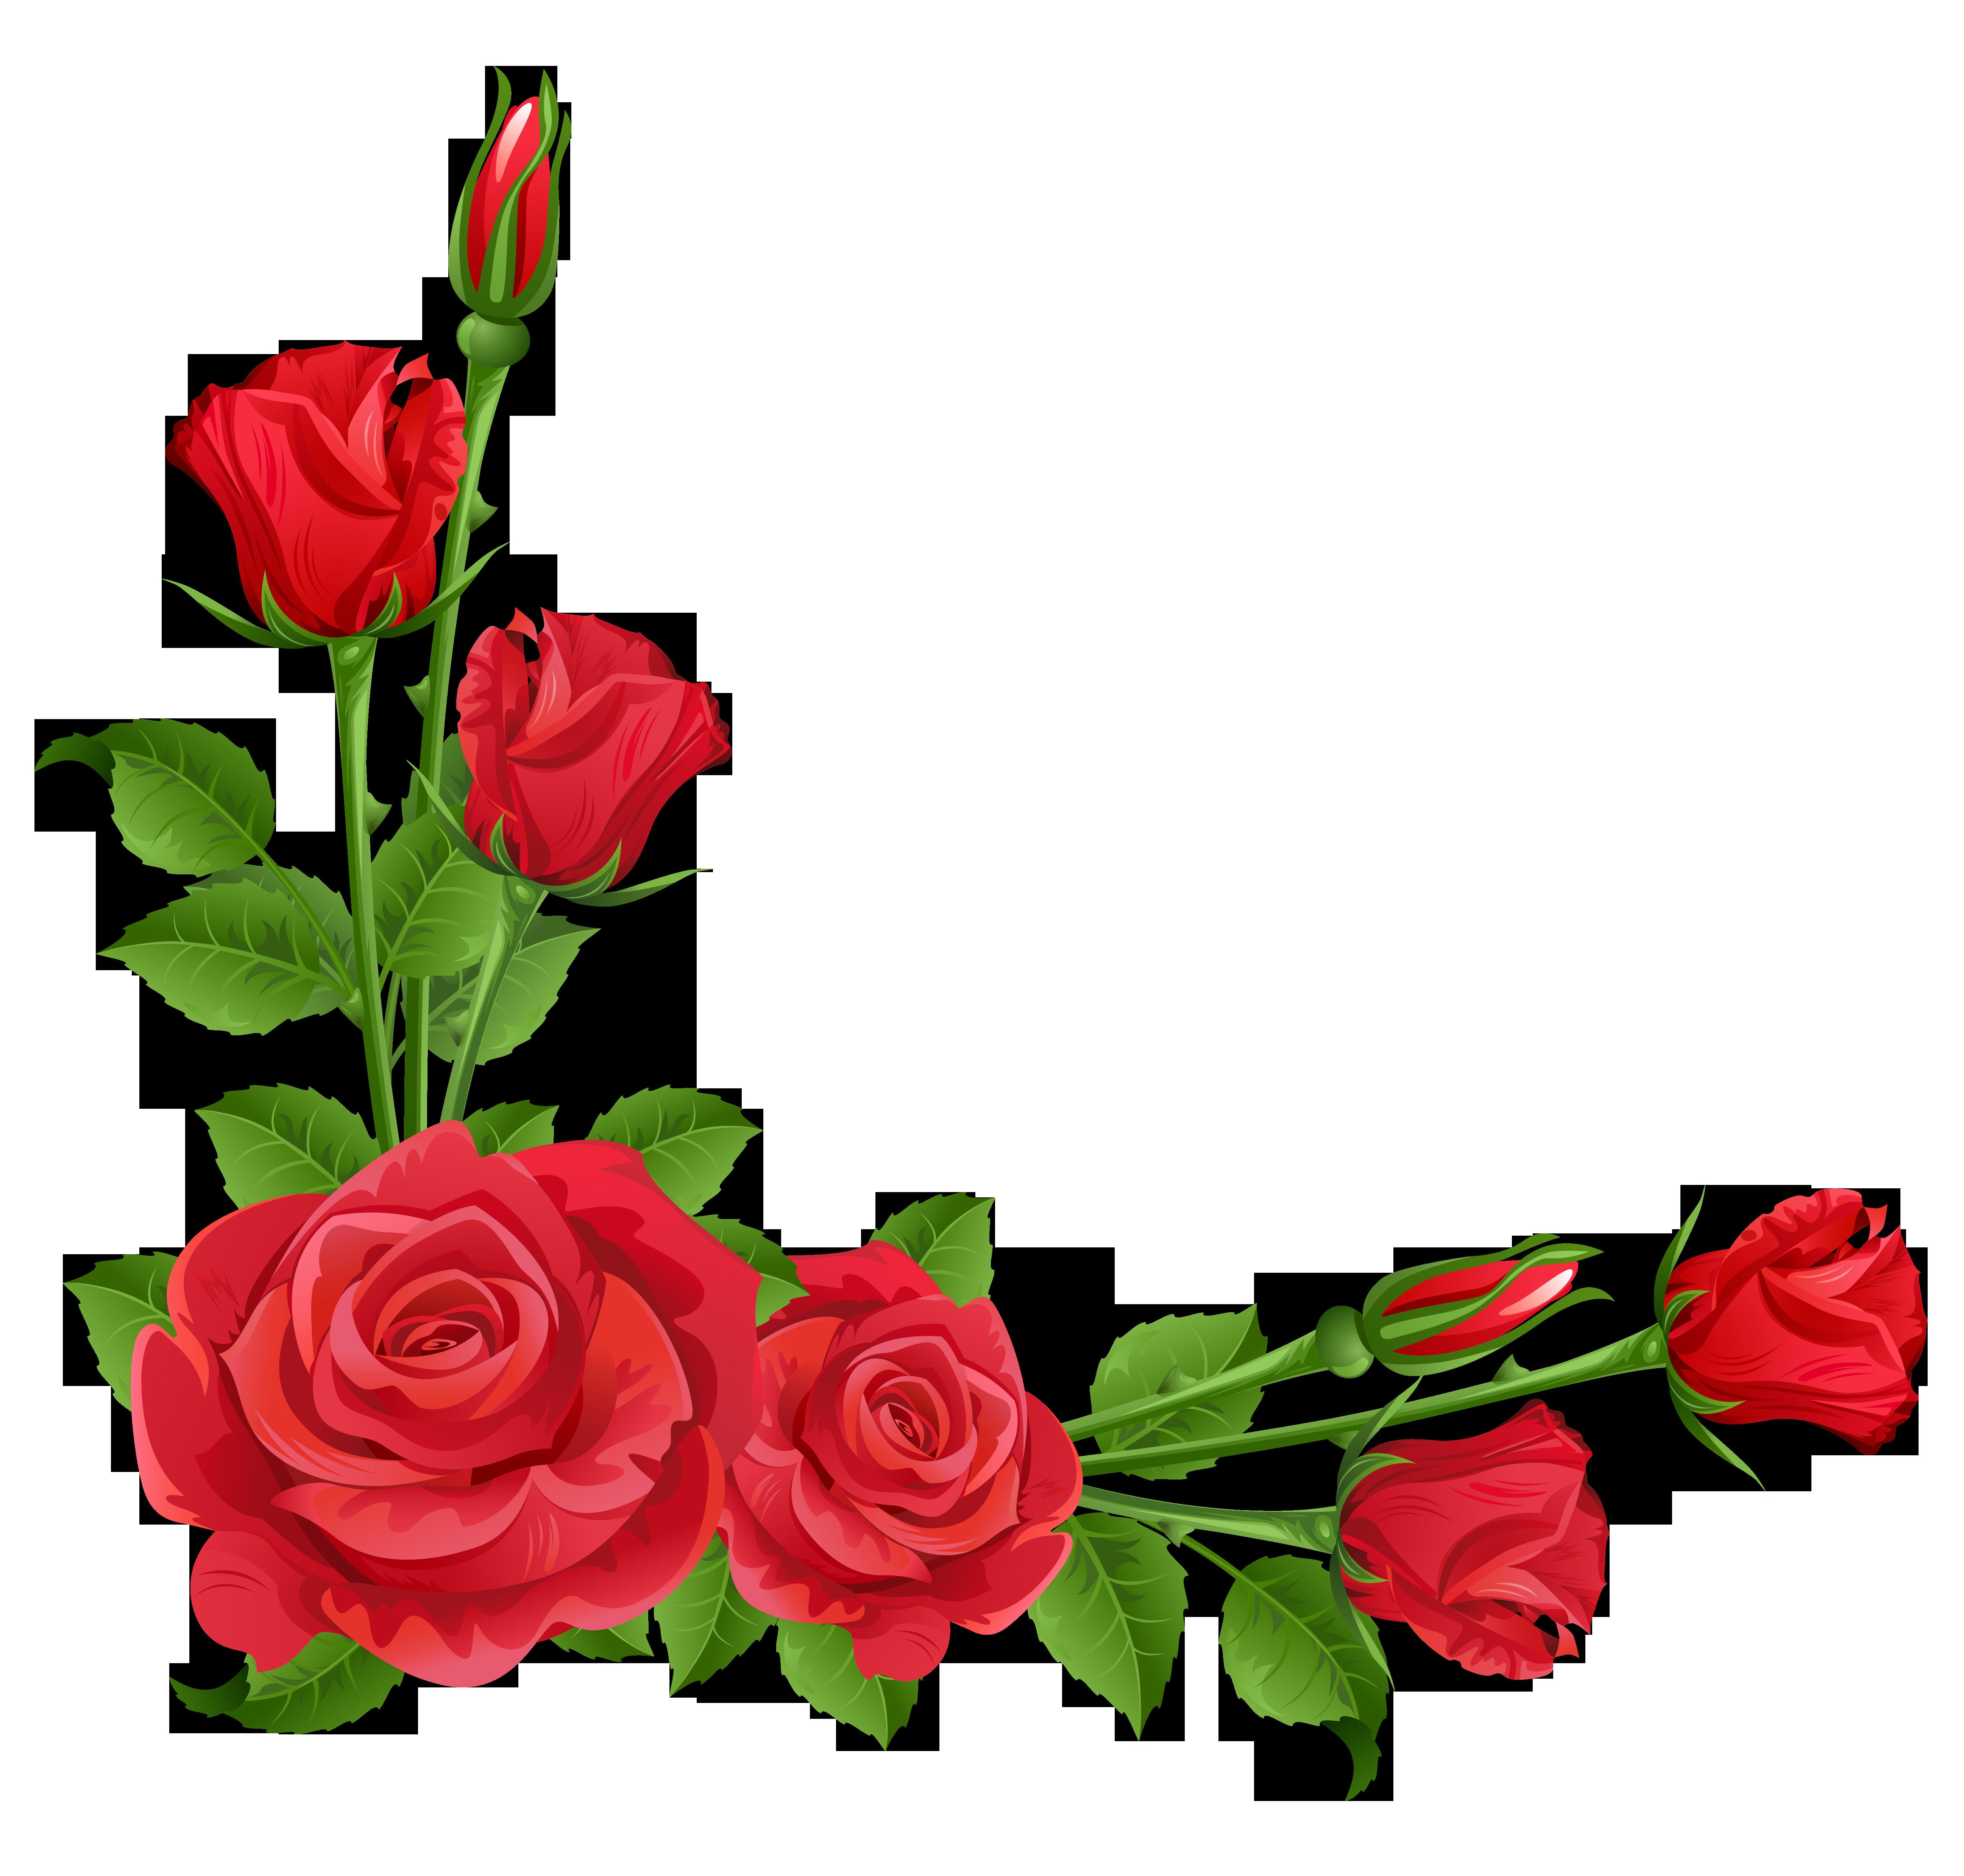 Red roses transparent png. Clipart design rose